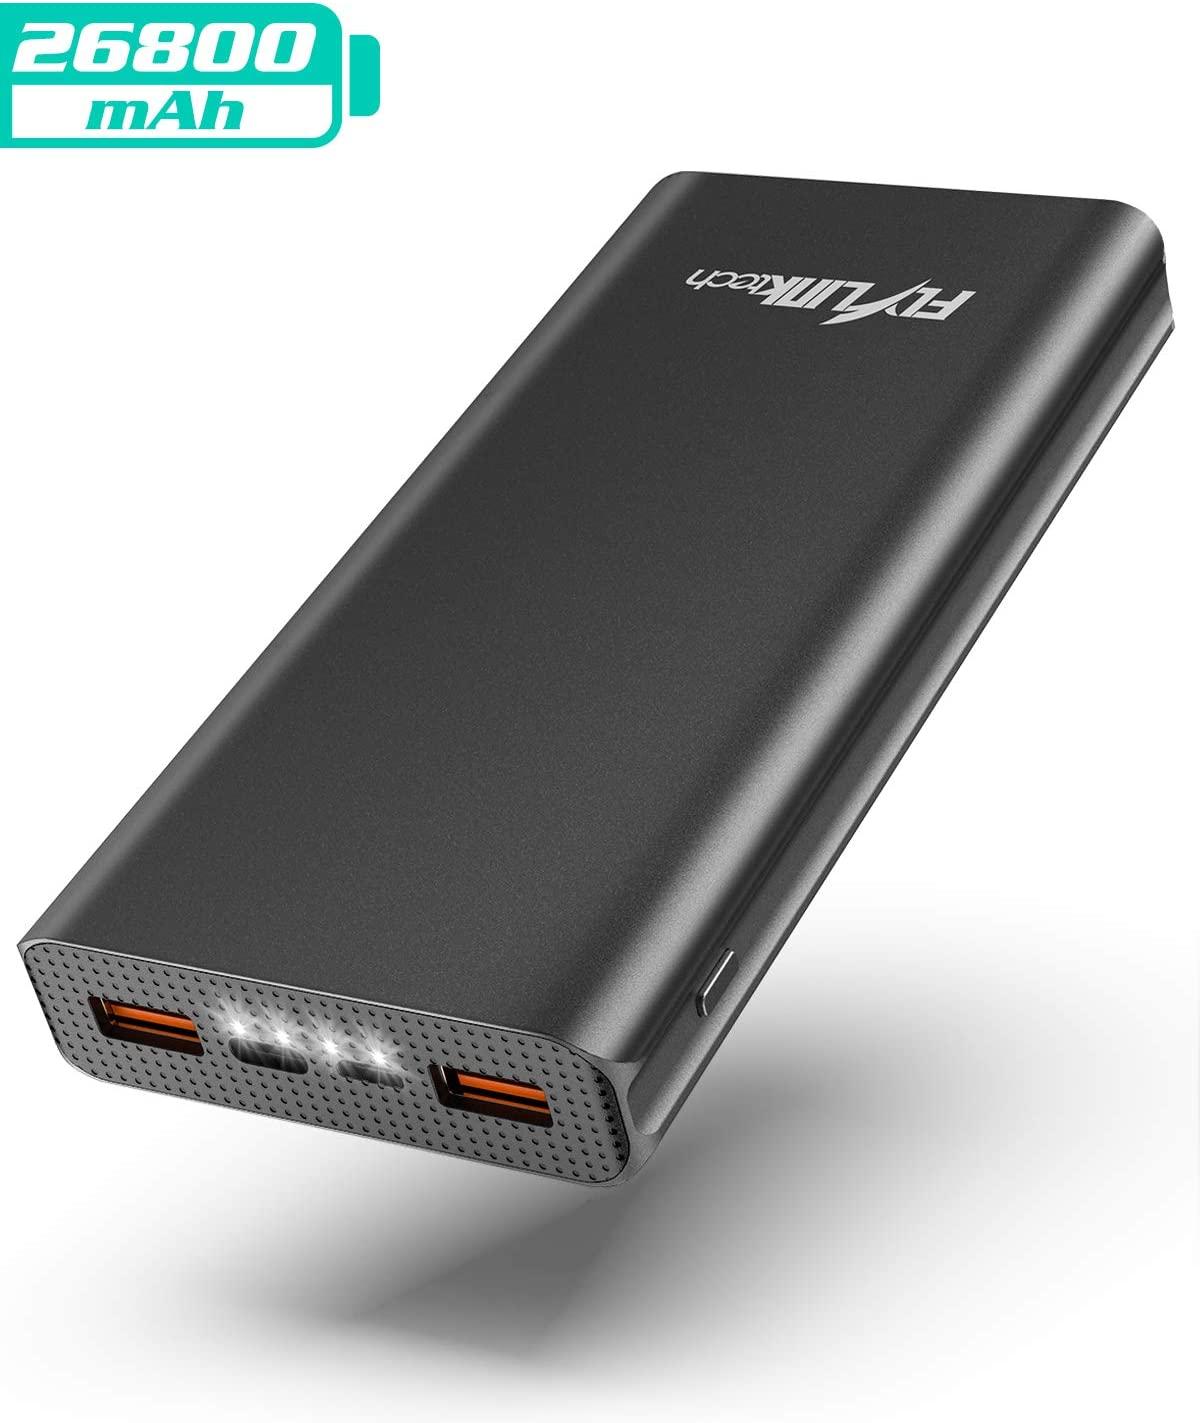 Muy buena oferta con cupón: Batería FLYLINKTECH externa 26800mAh QC 3.0 Power Bank con USB-C PD